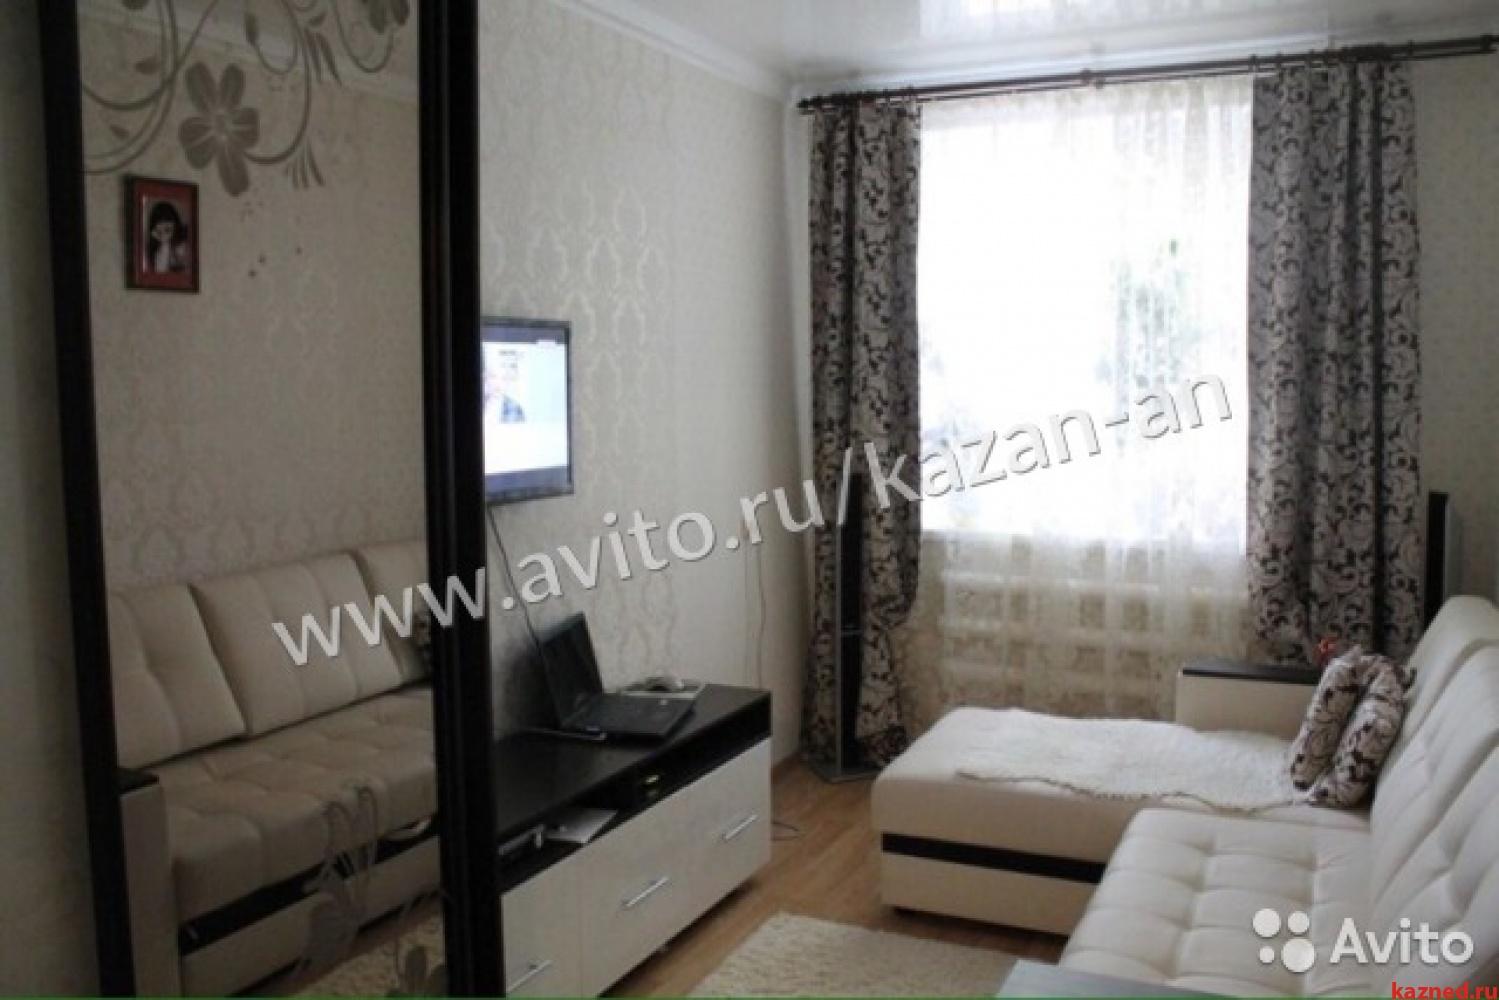 Продажа 2-к квартиры Солидарности (Дербышки) ул, 32, 50 м² (миниатюра №1)